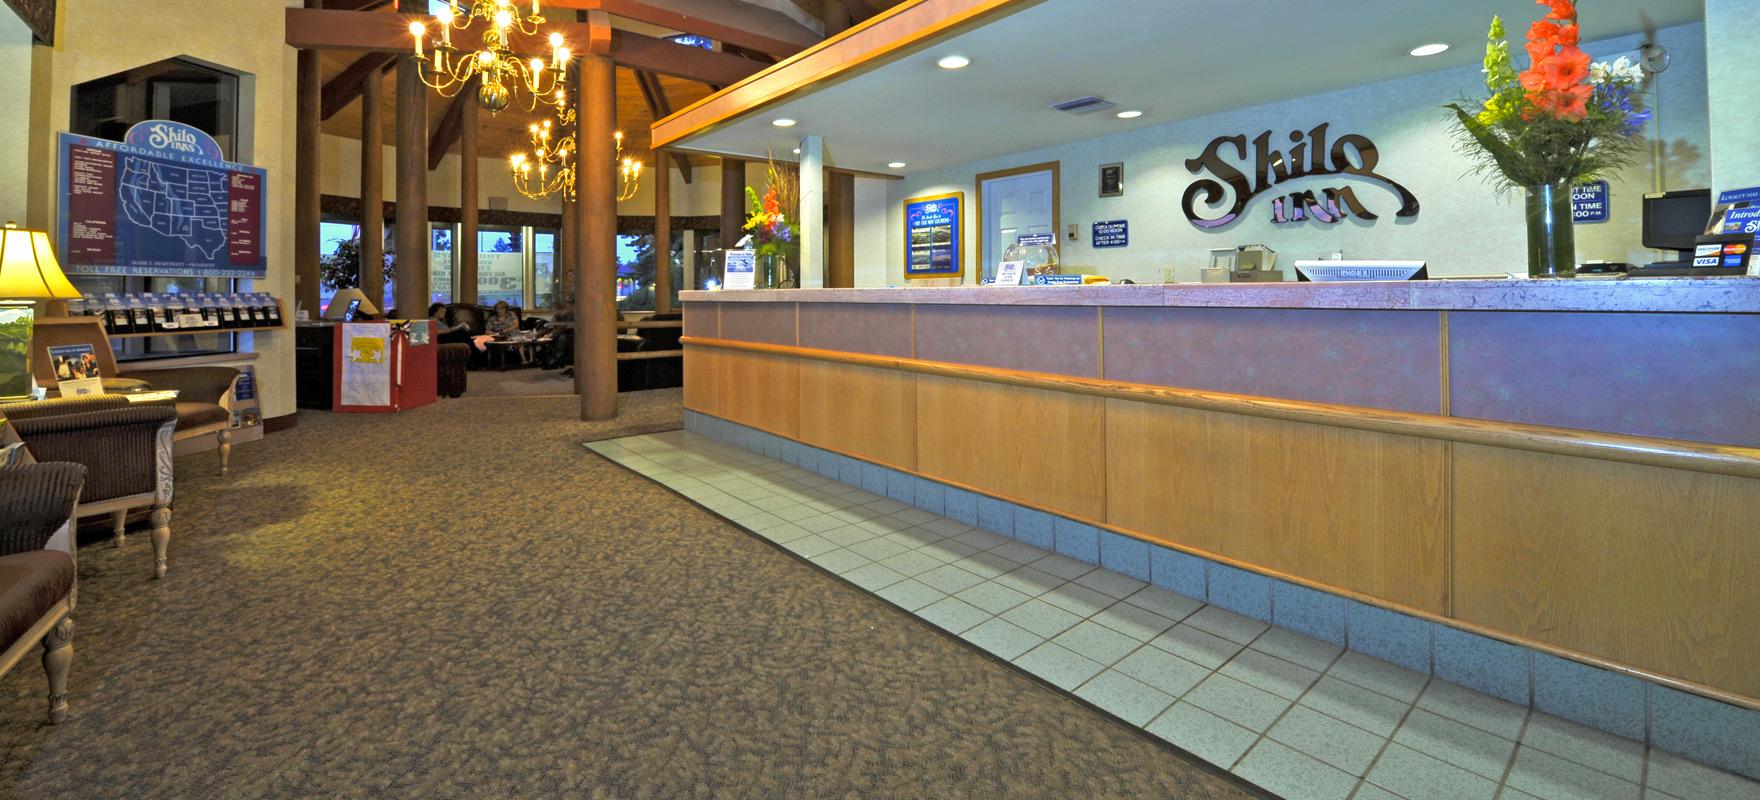 Shilo Inns Suites Hotels Bend Oregon